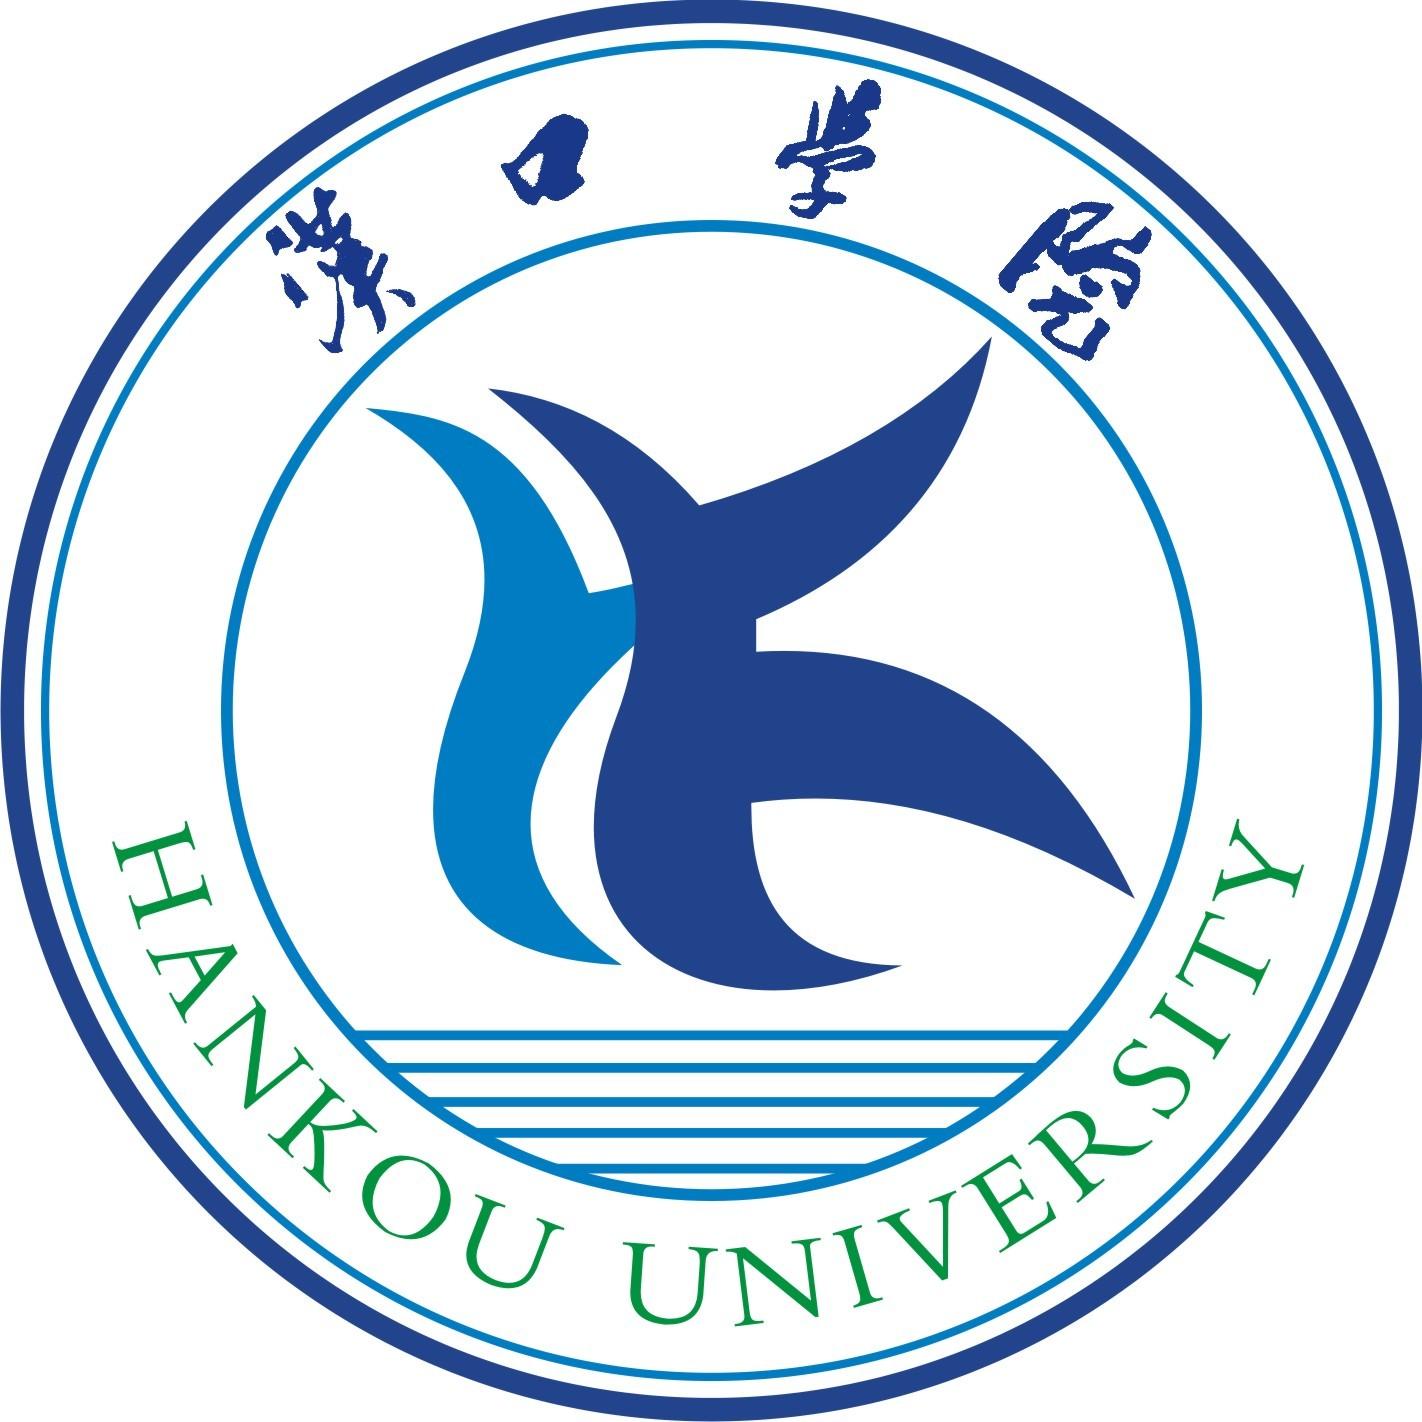 logo logo 标志 设计 图标 1422_1422